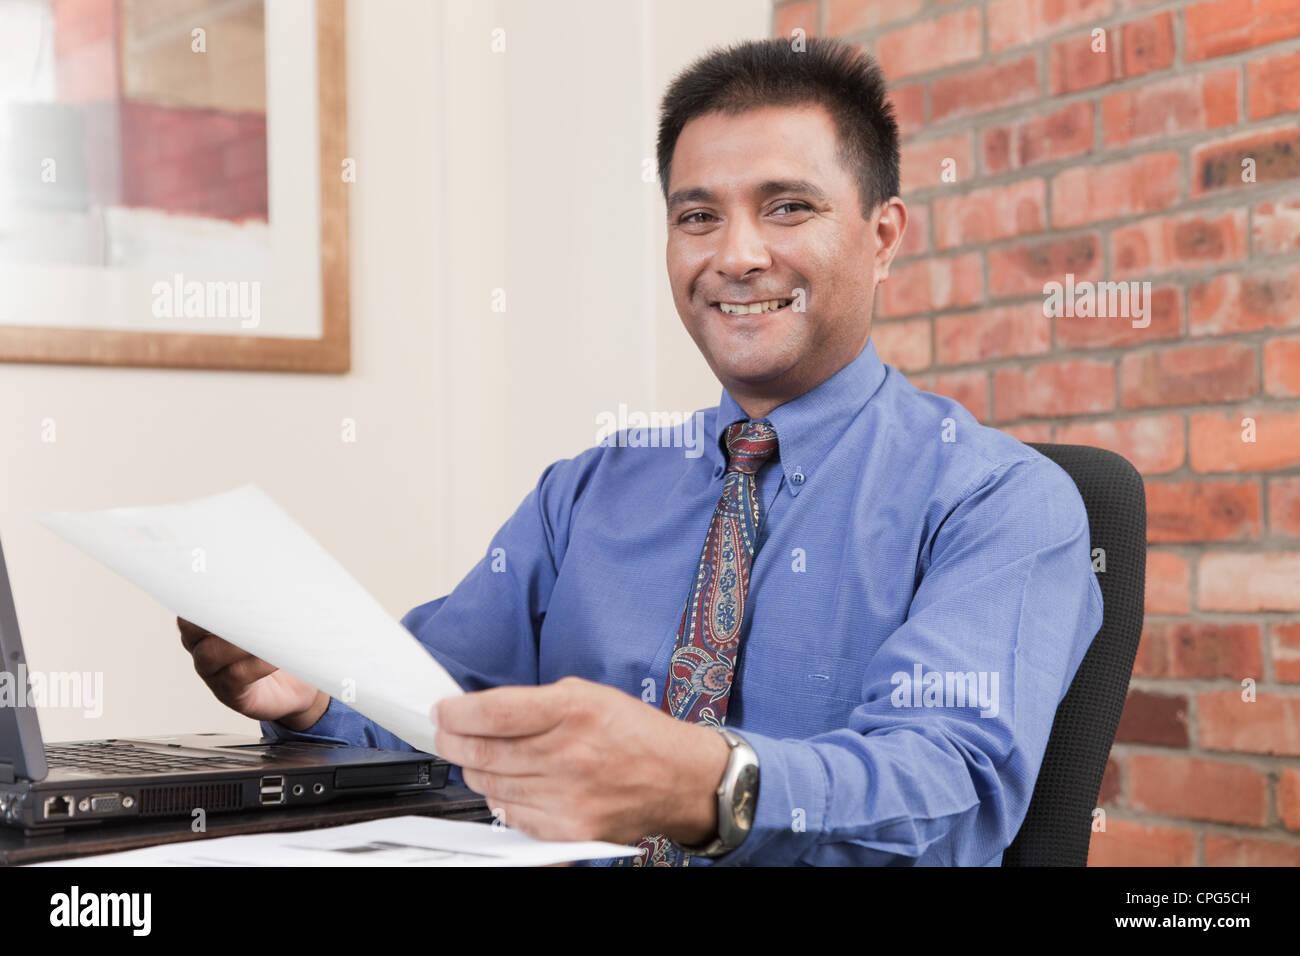 Businessman holding document at desk, smiling. - Stock Image